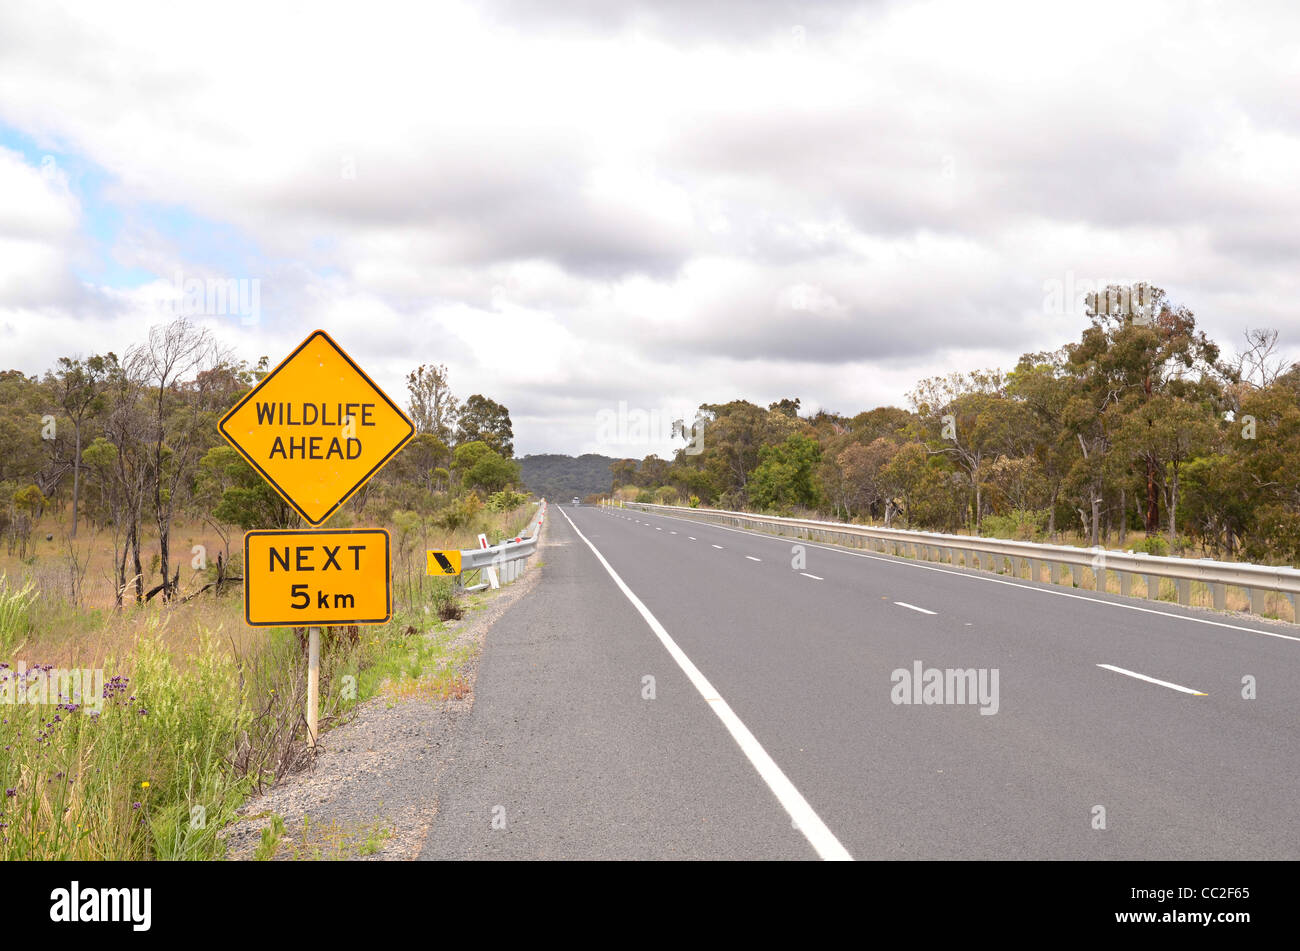 Road sign Wildlife ahead next 5km Stock Photo